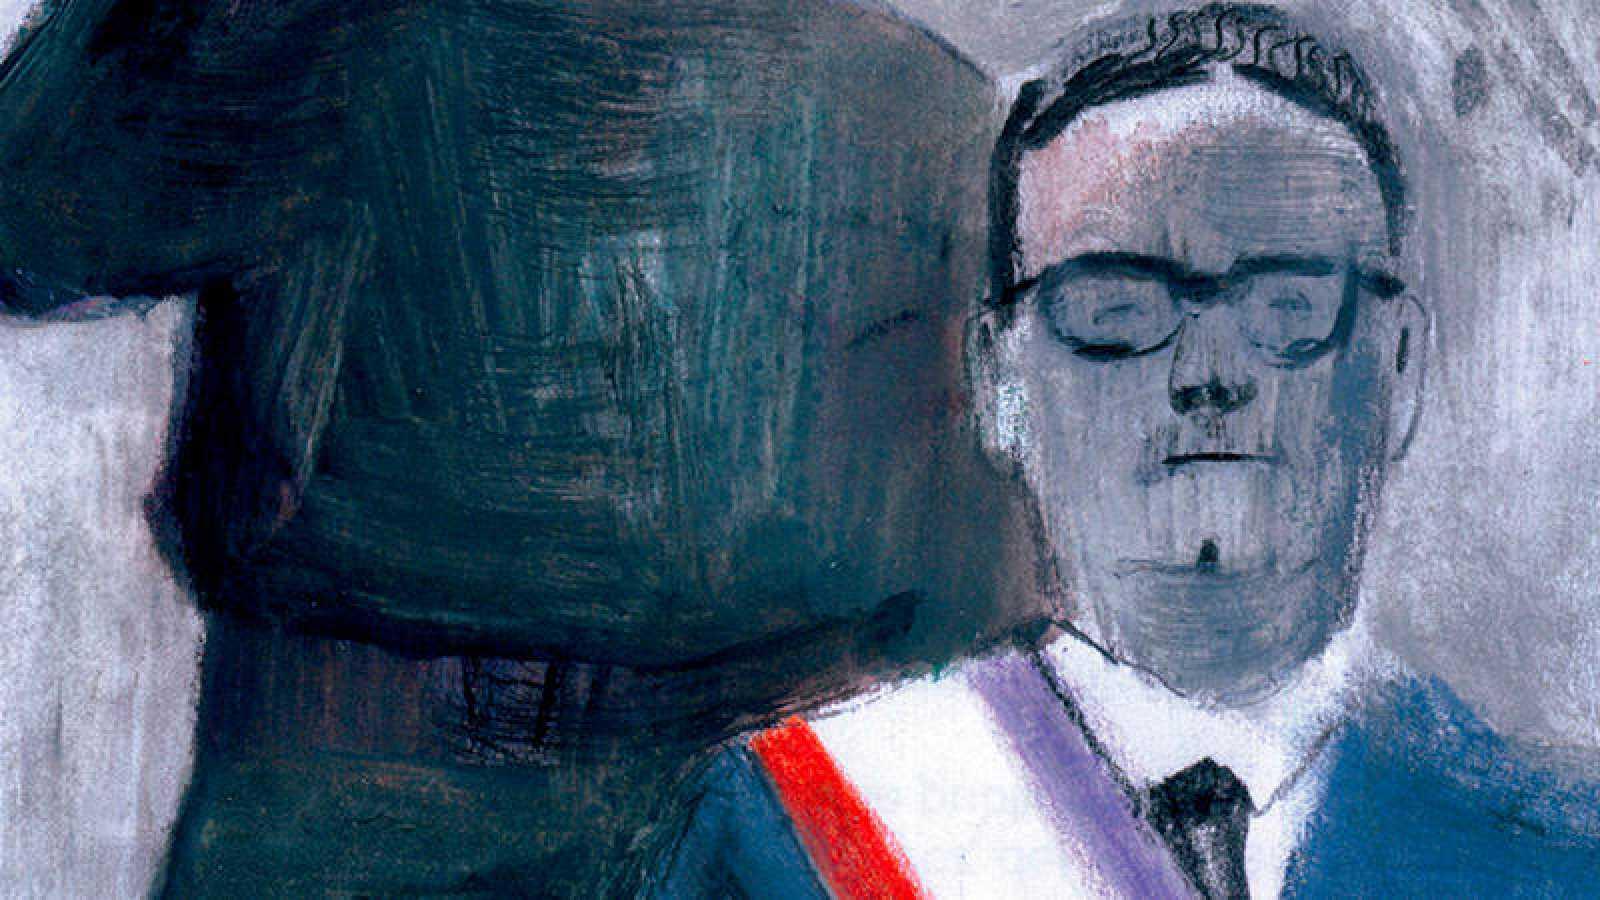 Jorge Gonzalez Me Gusta Allende Y Odio A Pinochet Rtve Es